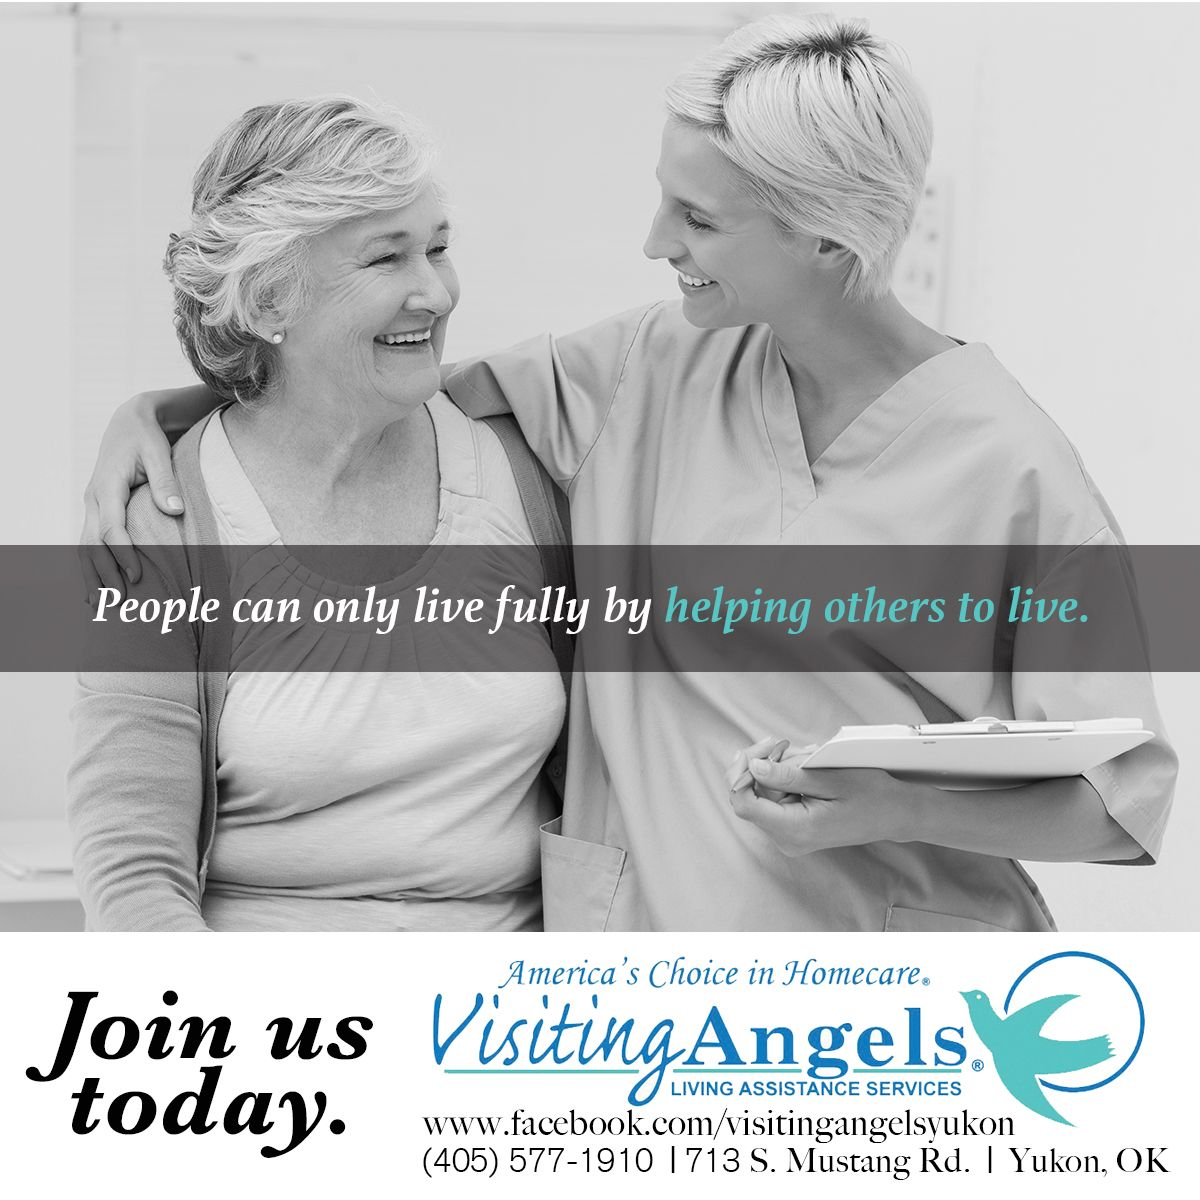 homehealth careers visitingangels yukon oklahoma www